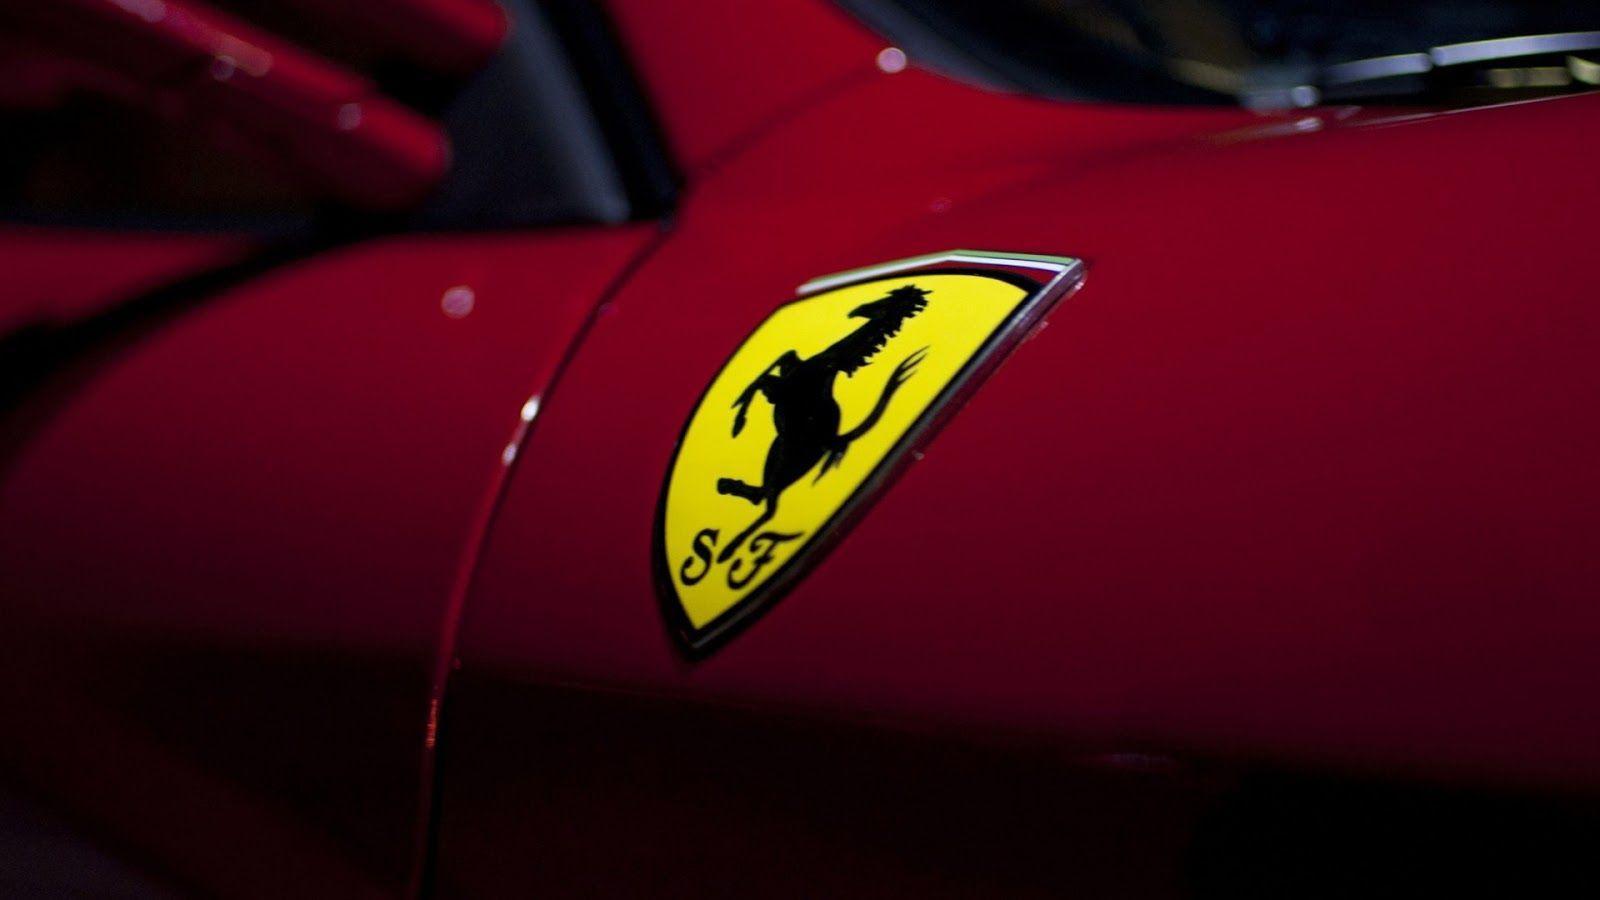 Ferrari Logo | HD Wallpapers (High Definition) | iPhone HD ...